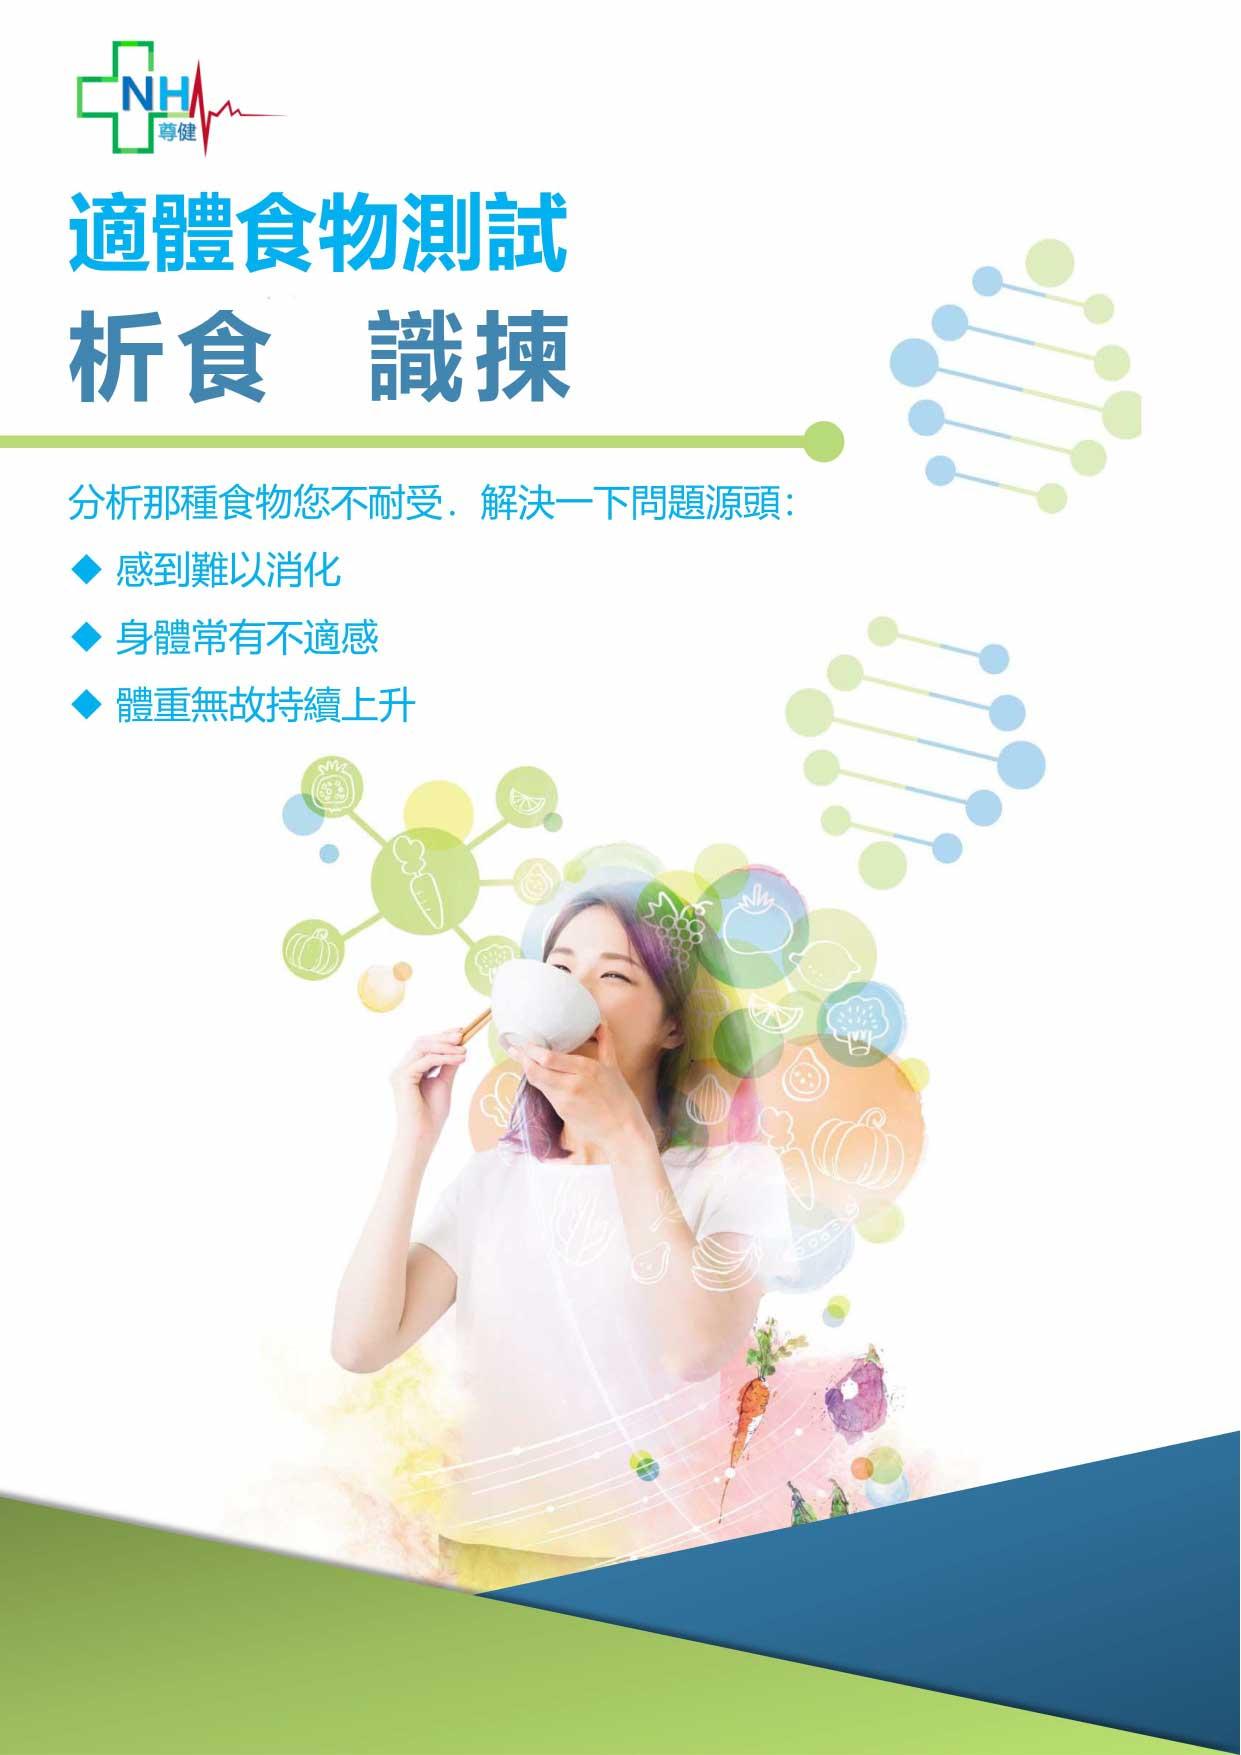 22plus-food-allergy-igg-test-1.jpg